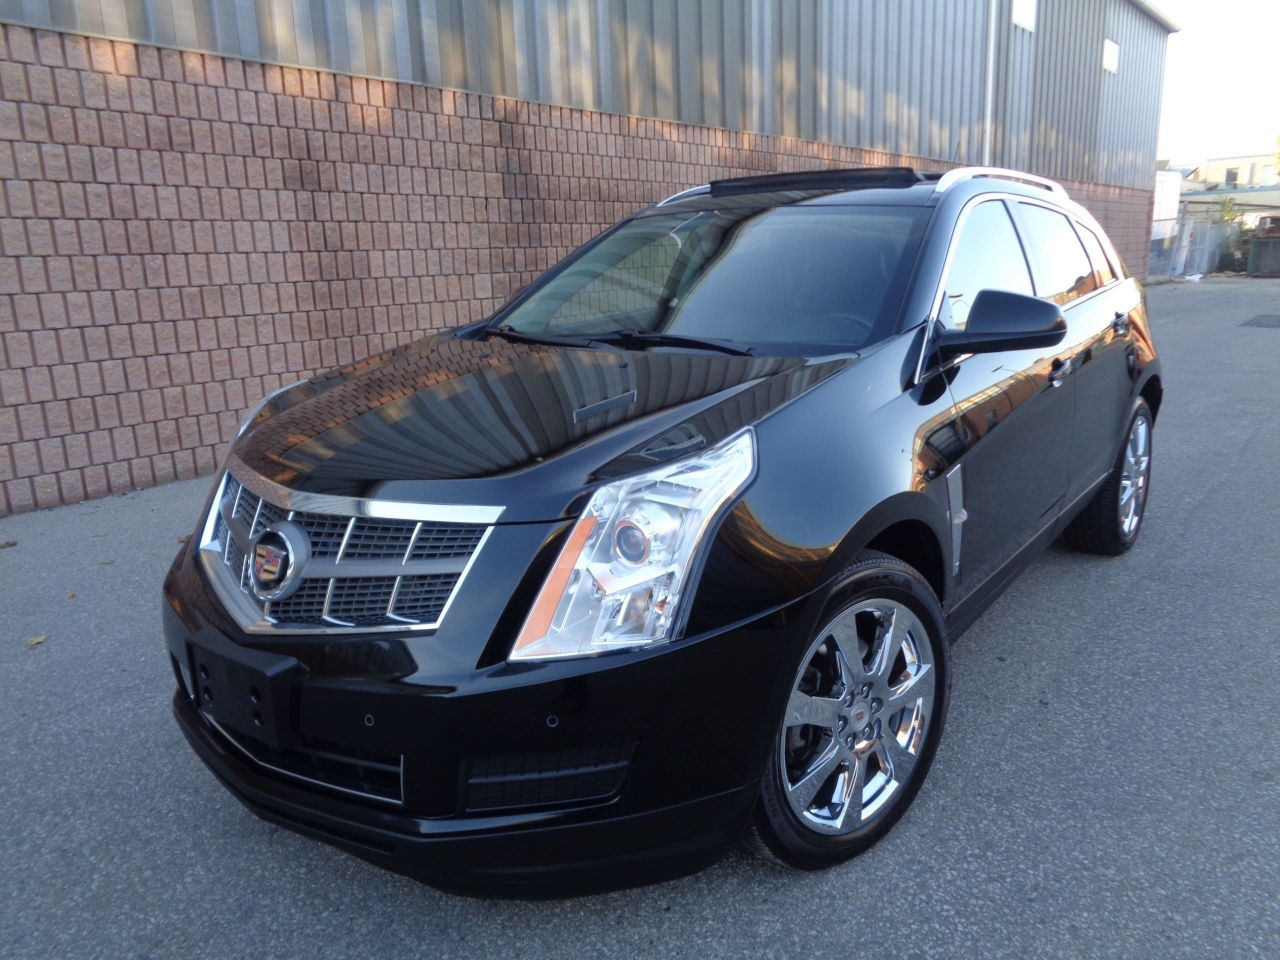 2011 Cadillac SRX ***SOLD***